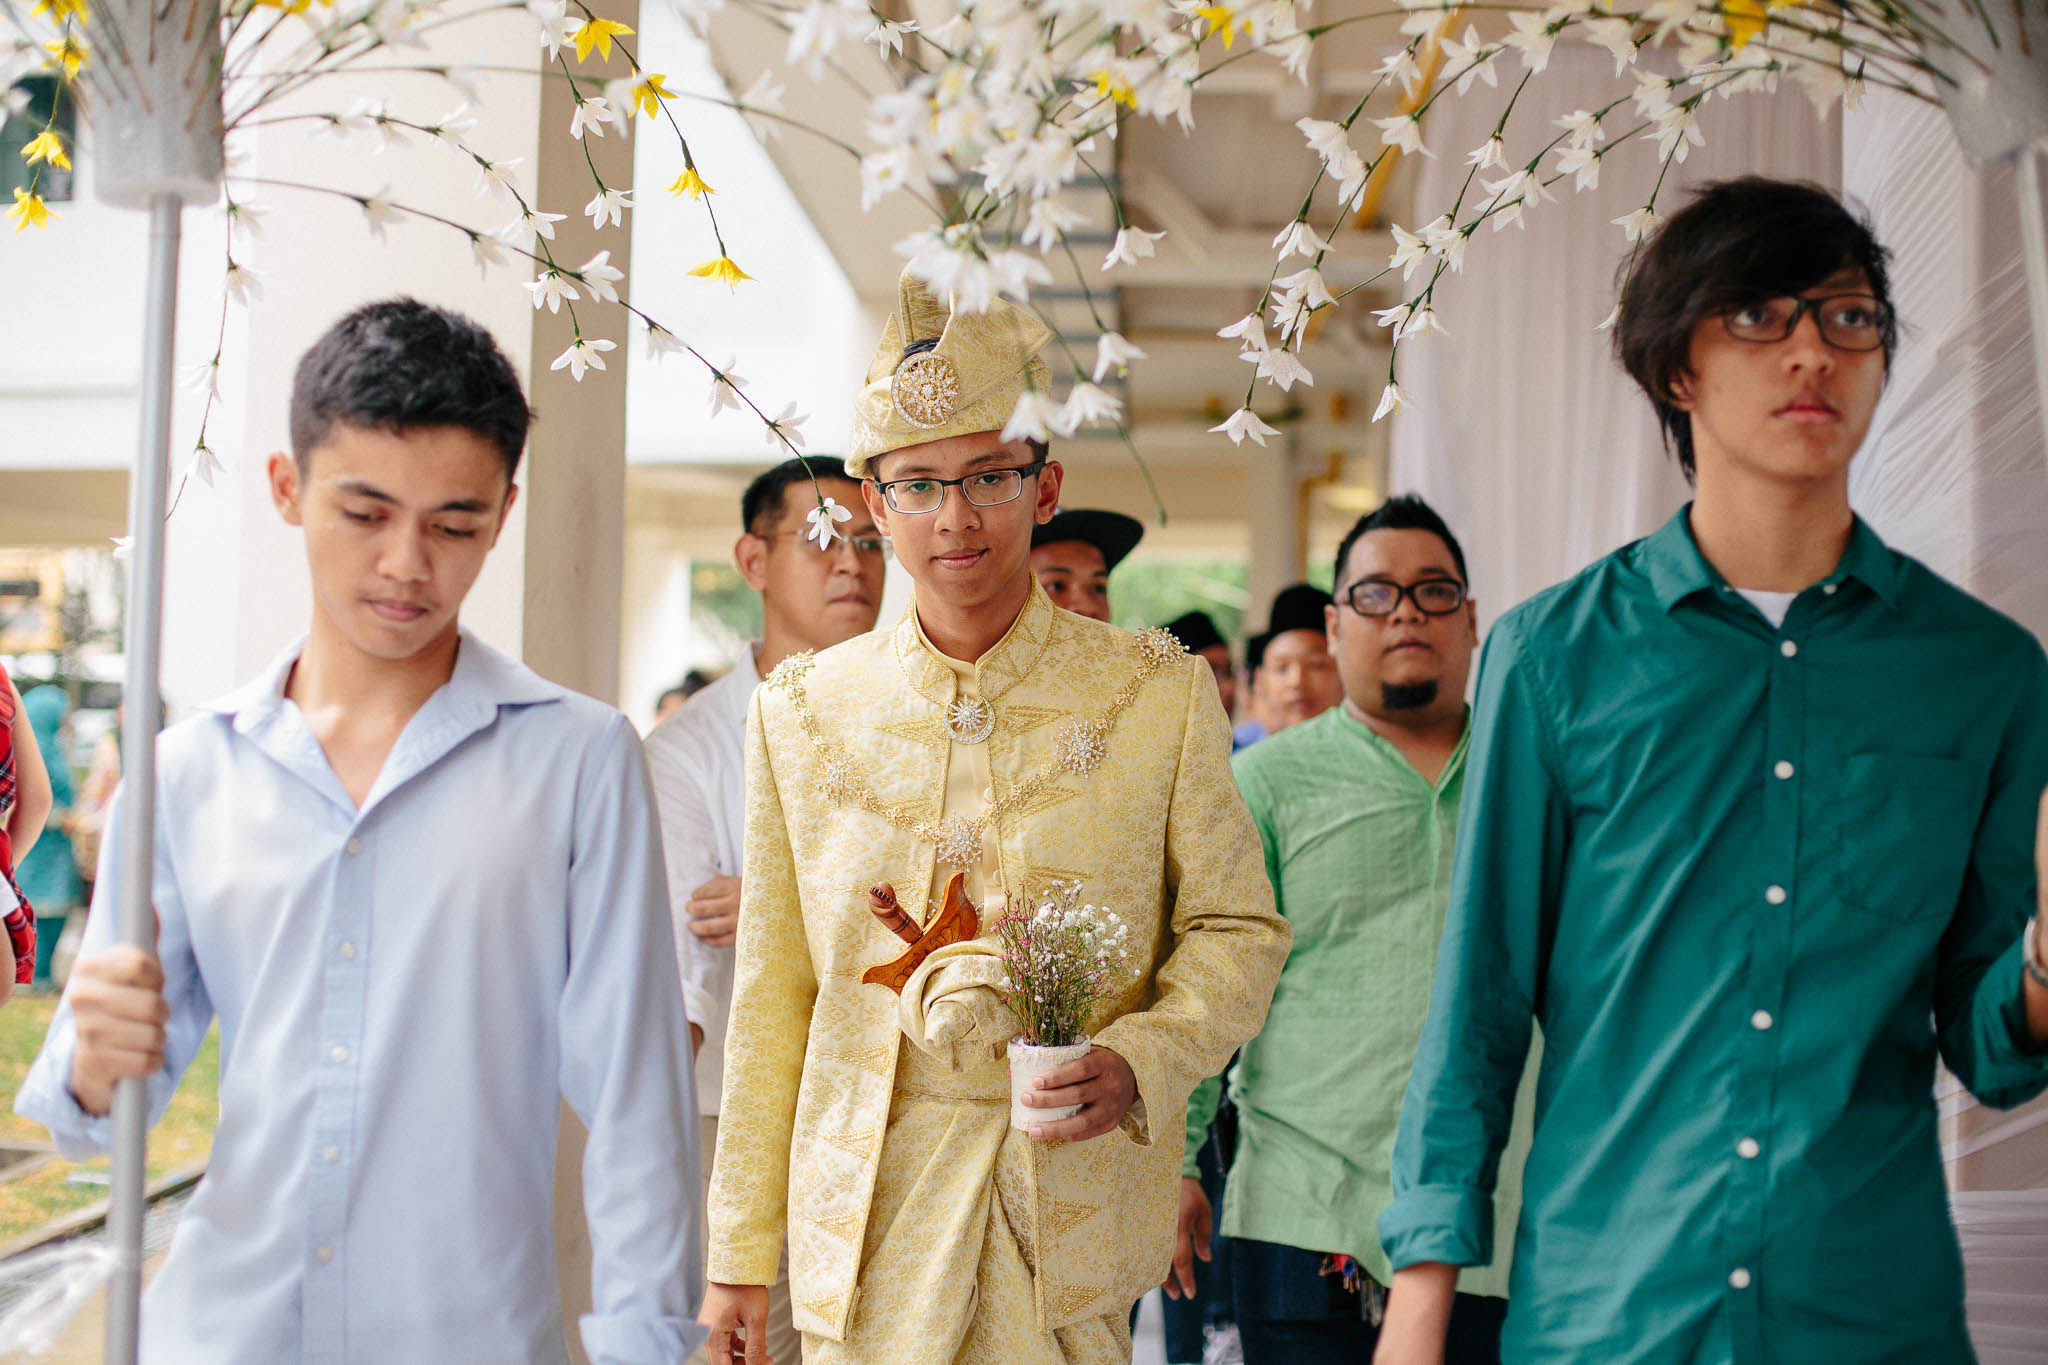 singapore-wedding-photographer-sharalyn-syazwan-029.jpg